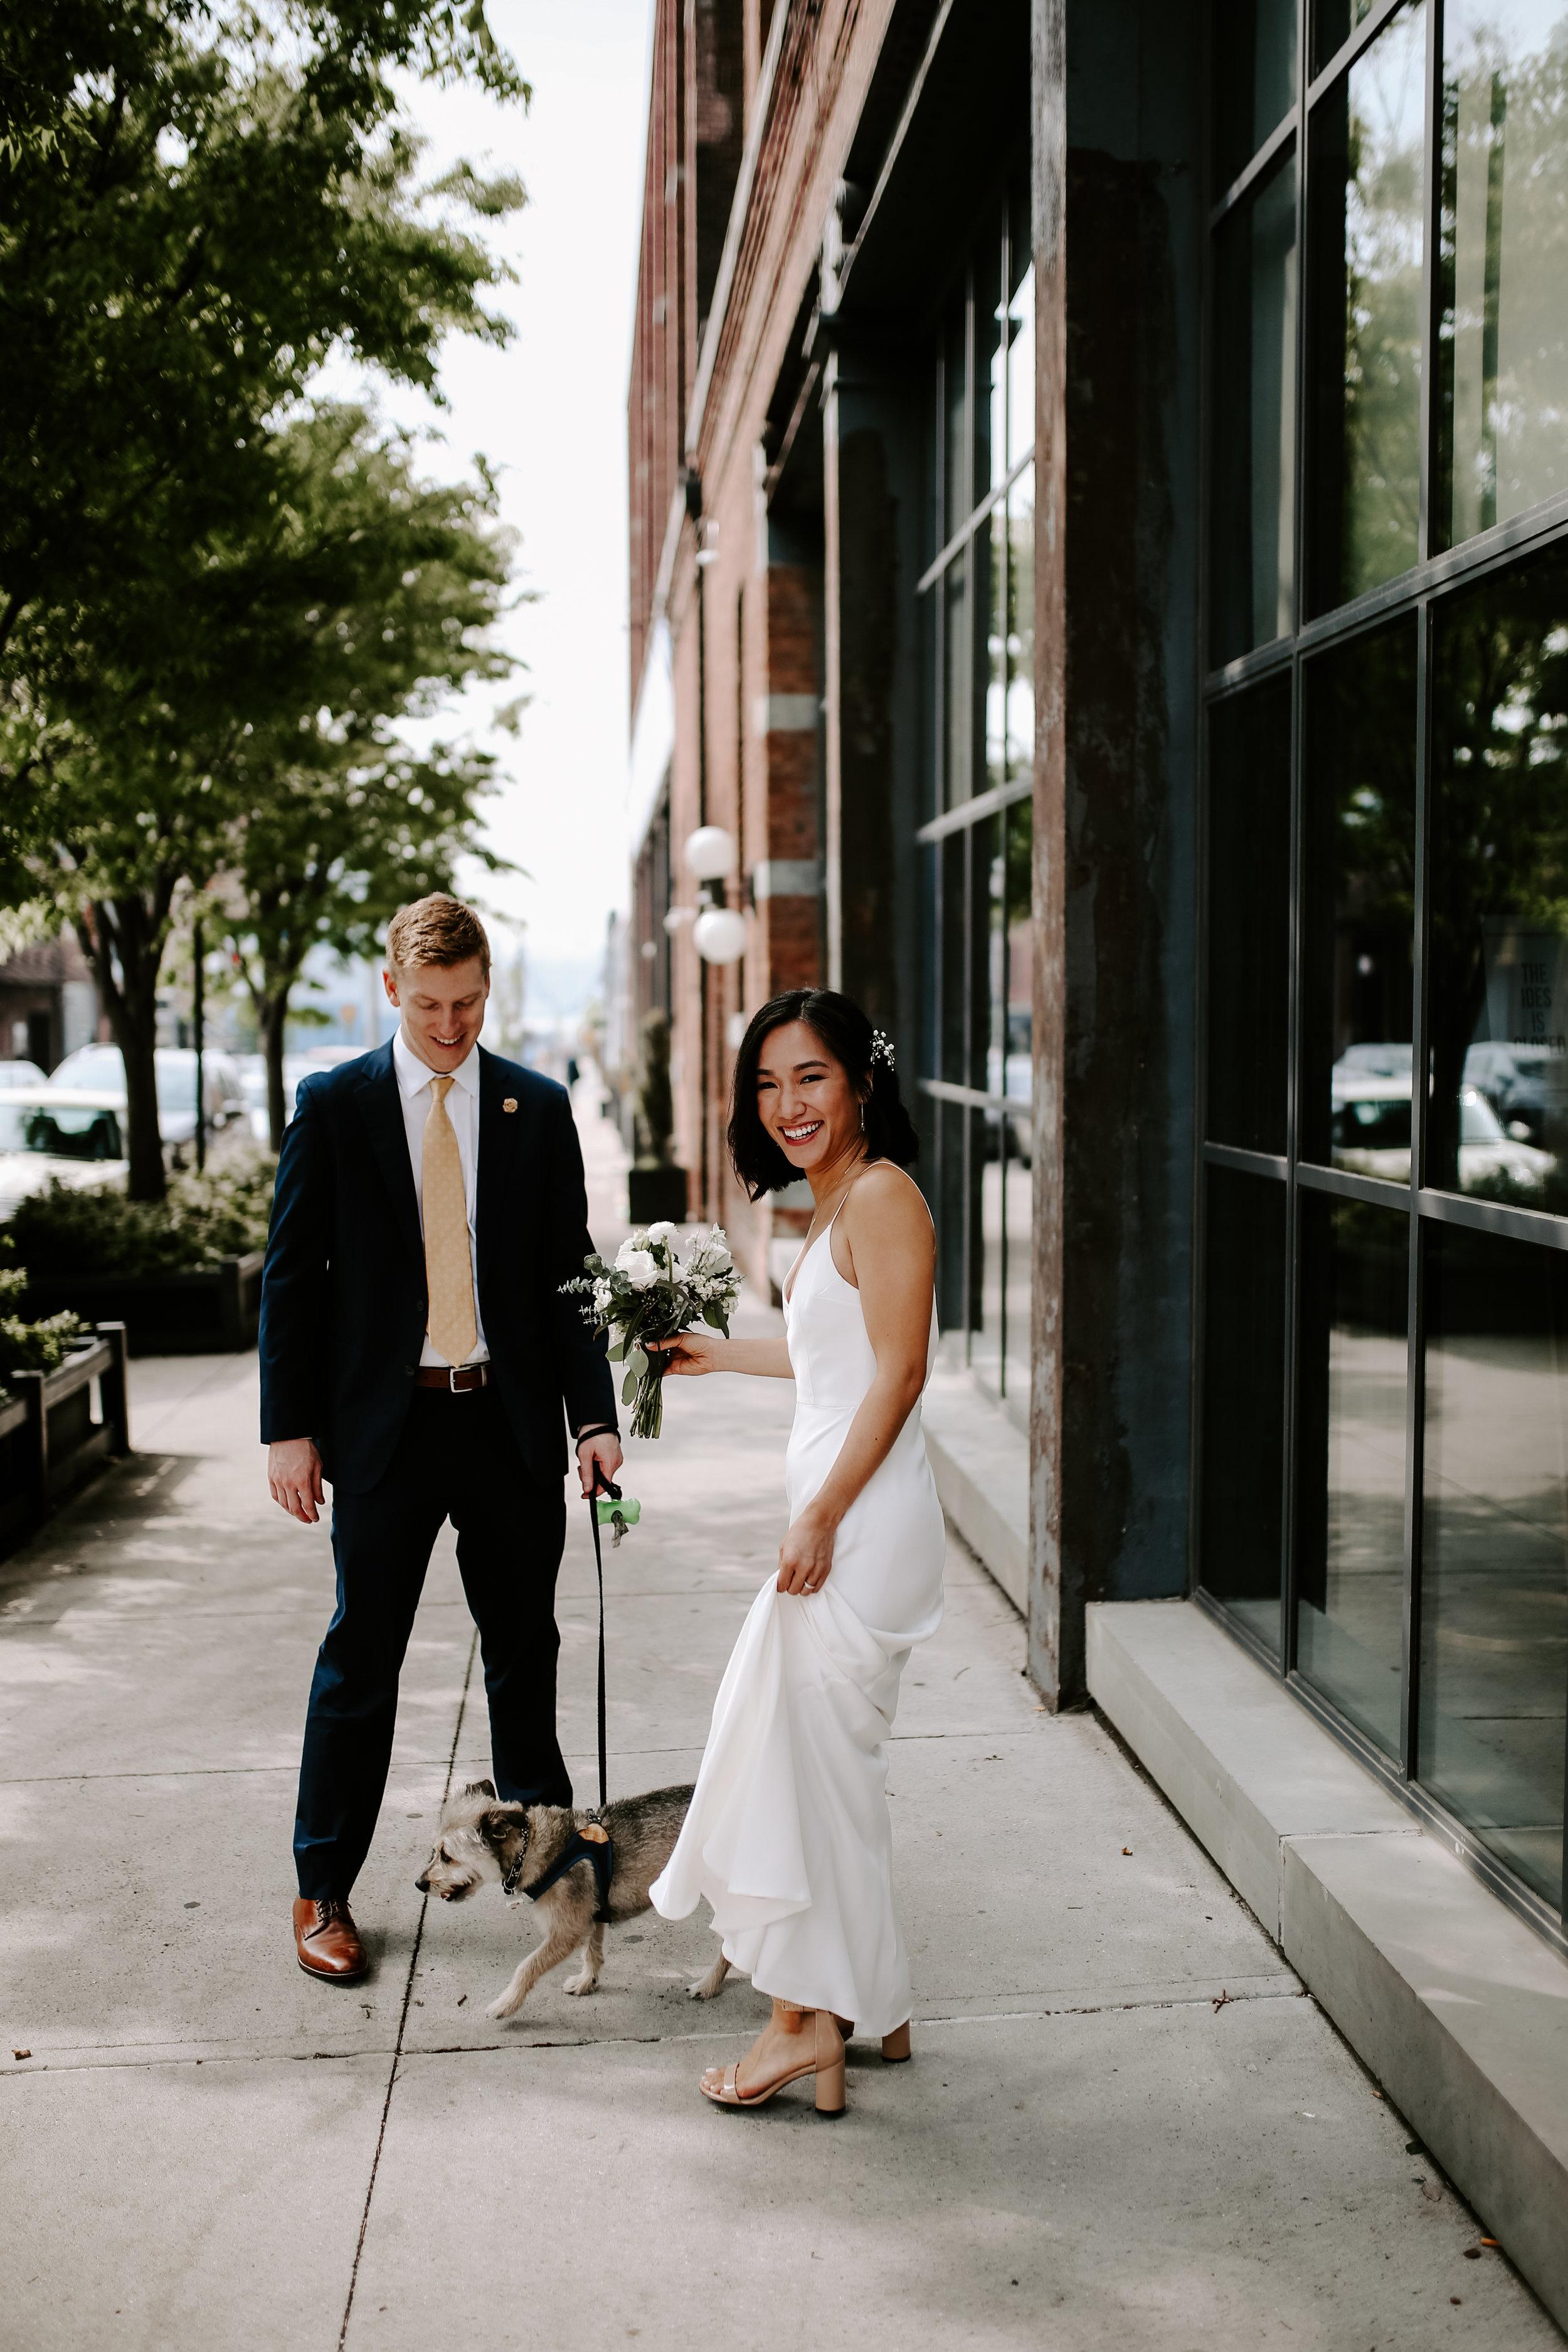 TheNichols_Married_2019-1-68.jpg